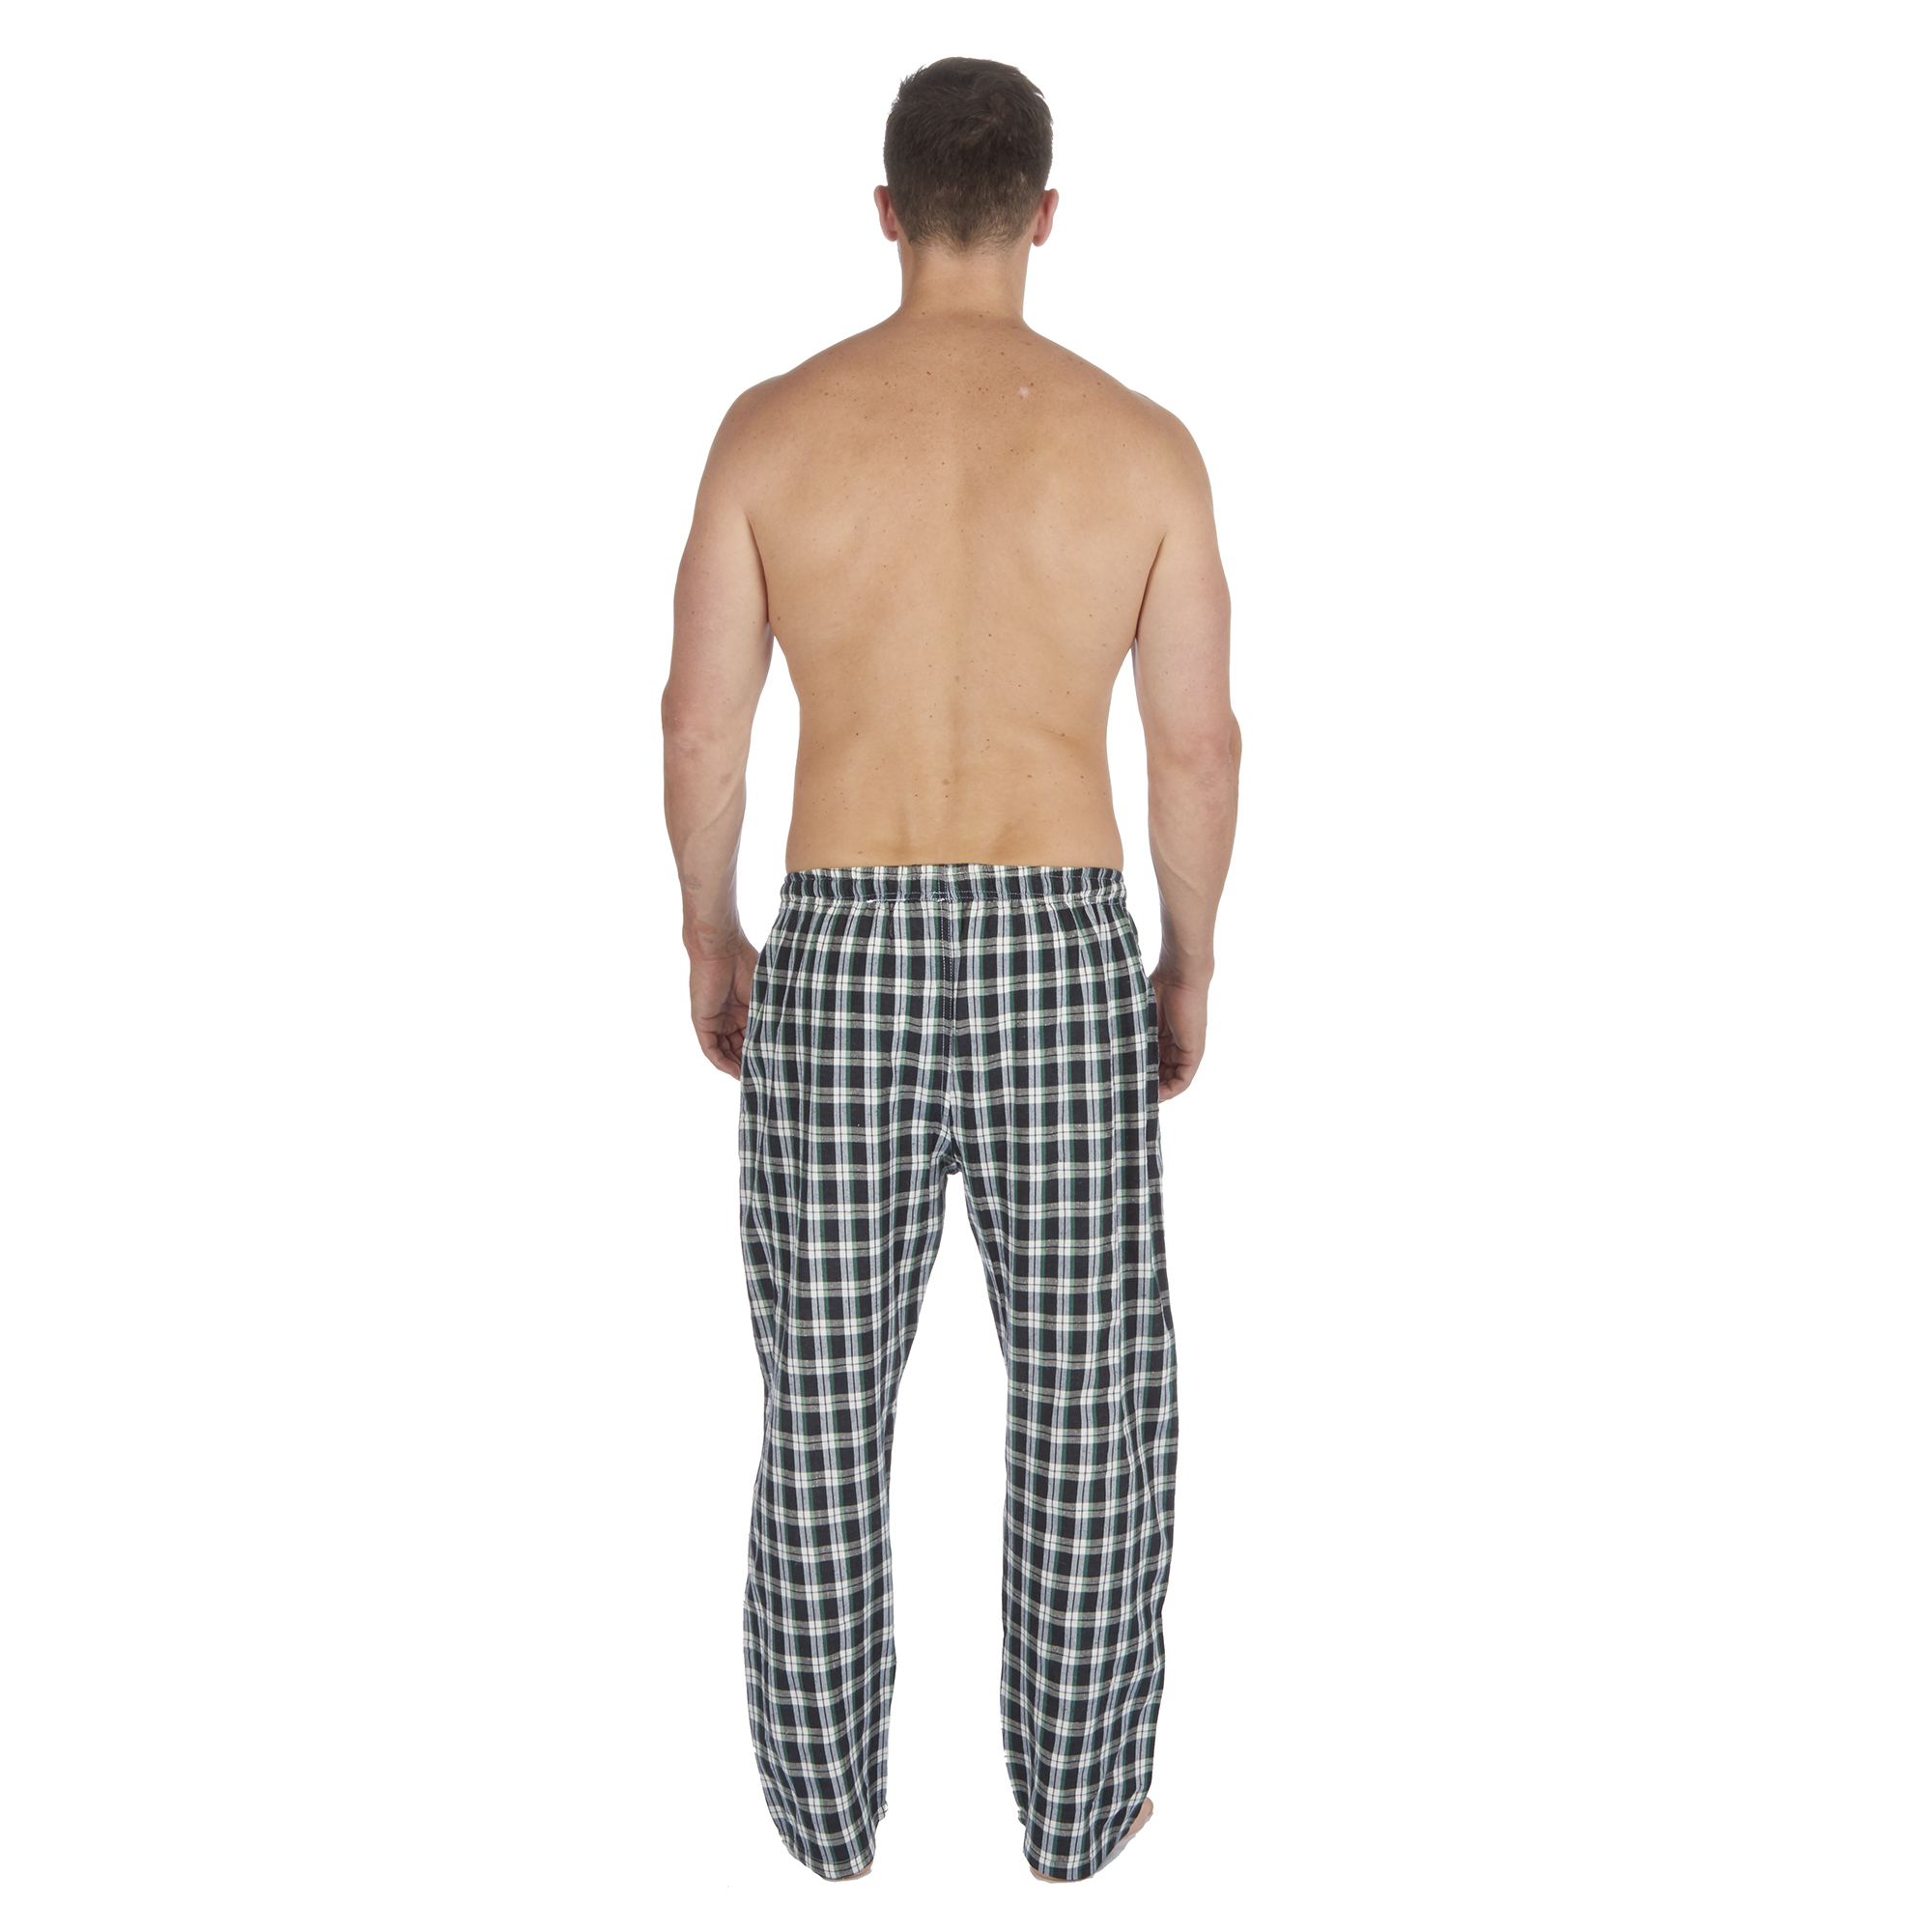 Jason-Jones-Homme-Carreaux-Tisse-Pyjama-Pantalon-en-Coton-Melange-Serge-PJ-Lounge-Pants miniature 13